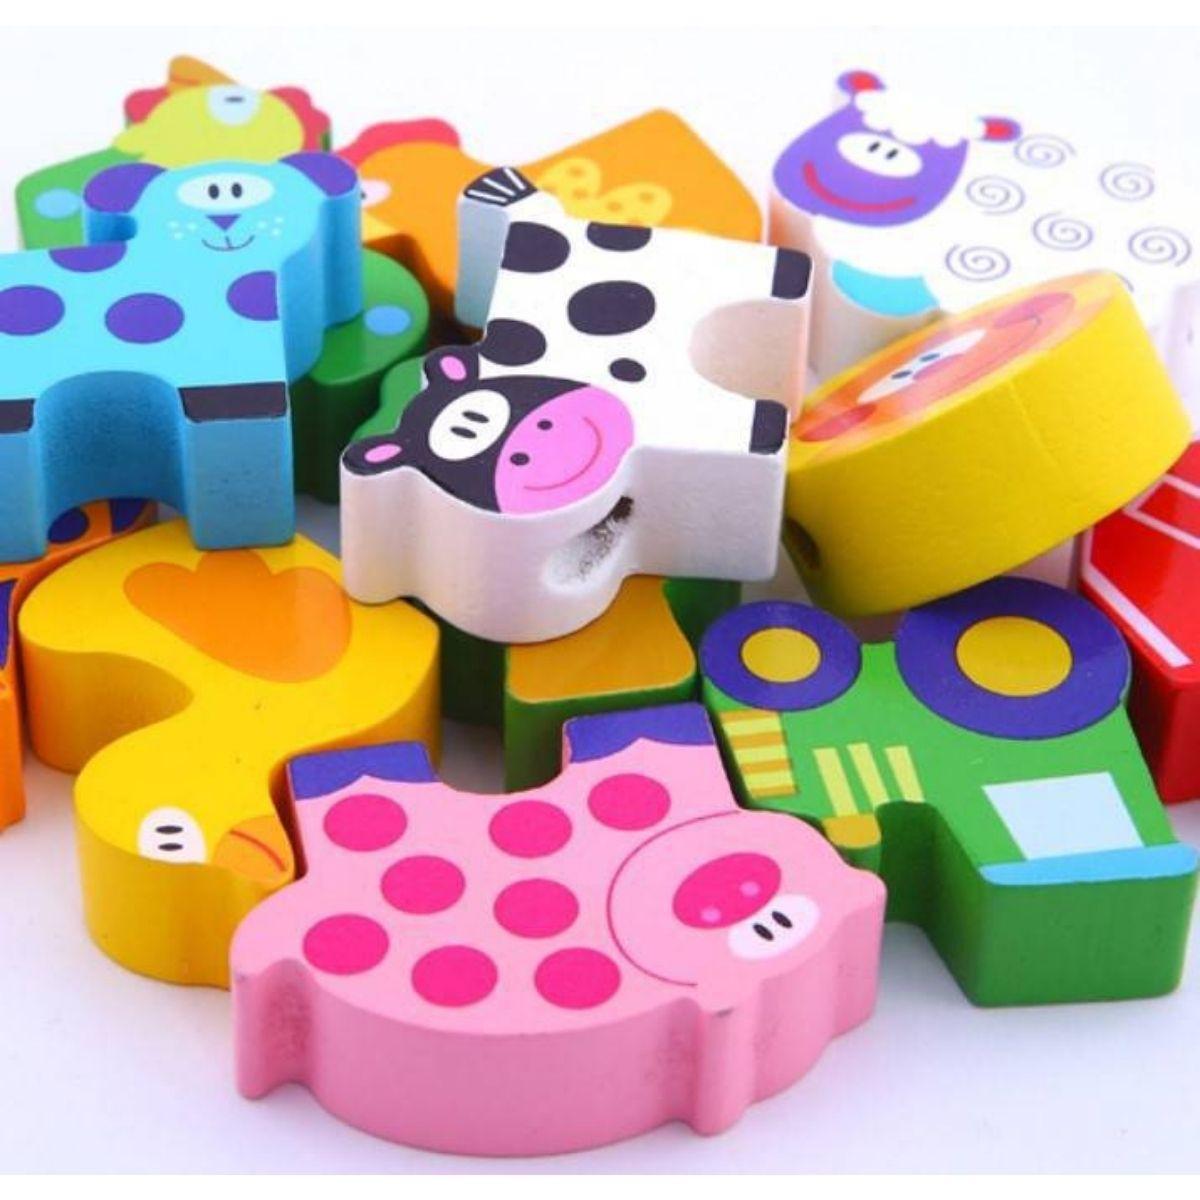 Brinquedo Educativo Lúdico Blocos de Laço Fazenda